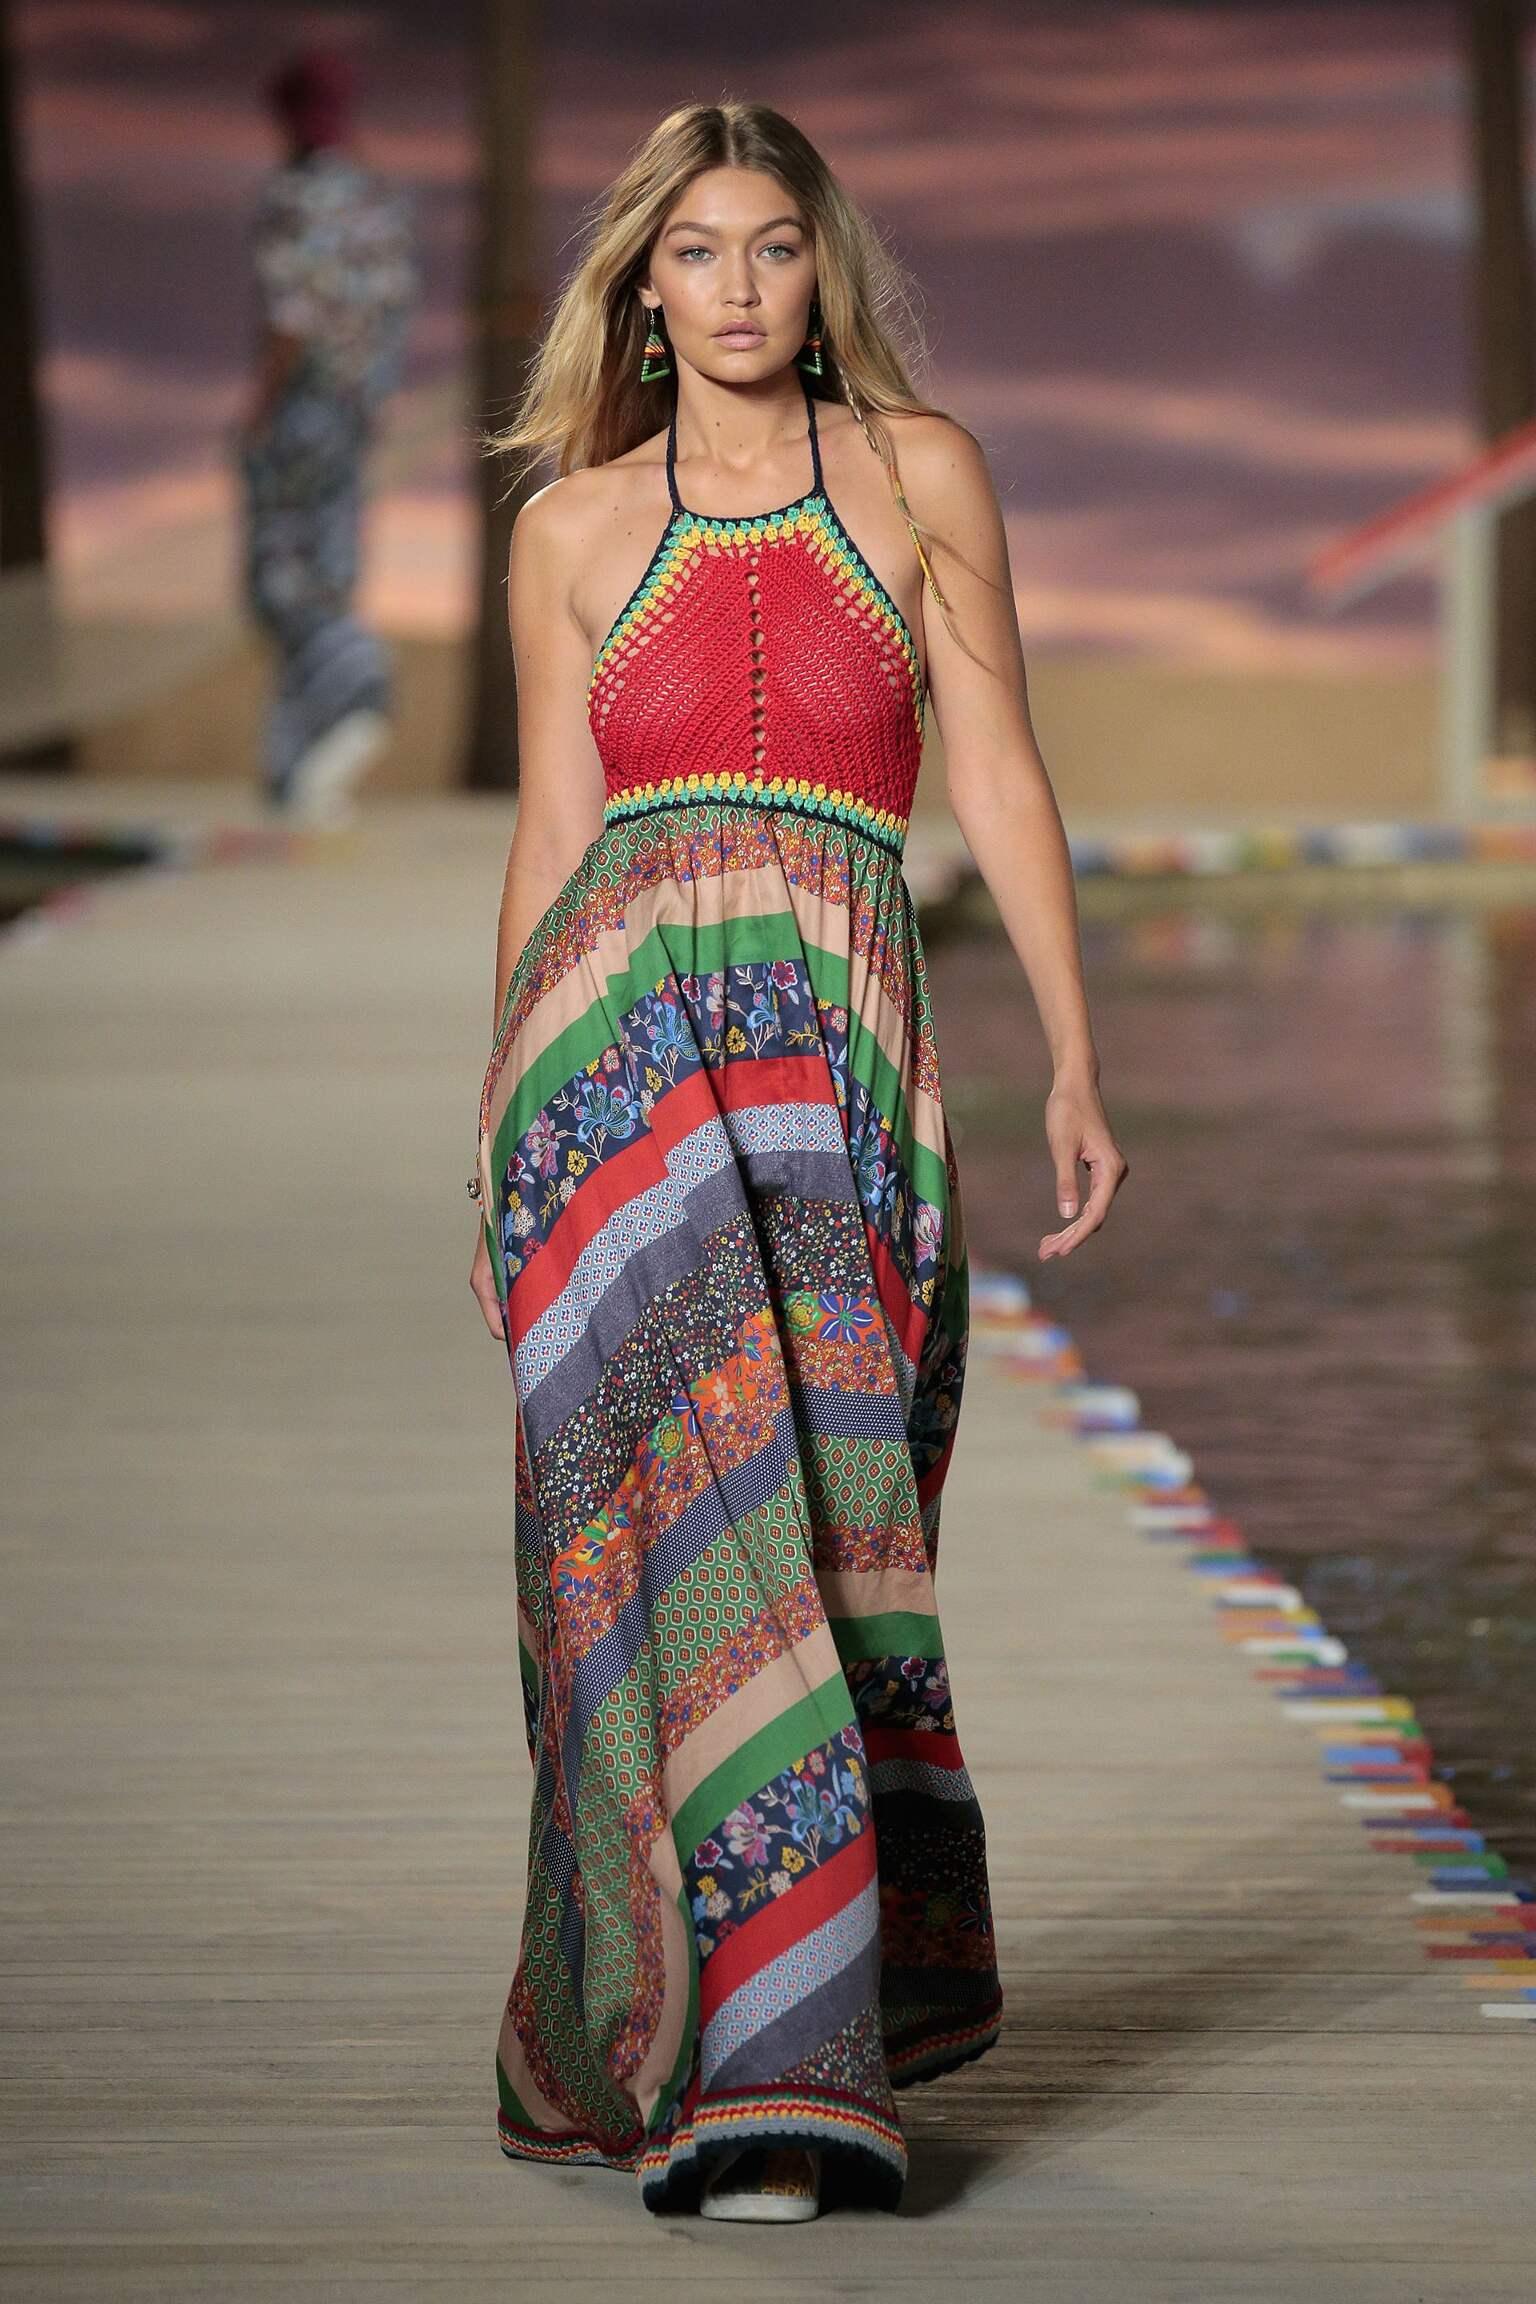 Catwalk Tommy Hilfiger Woman Fashion Show Summer 2016 New York